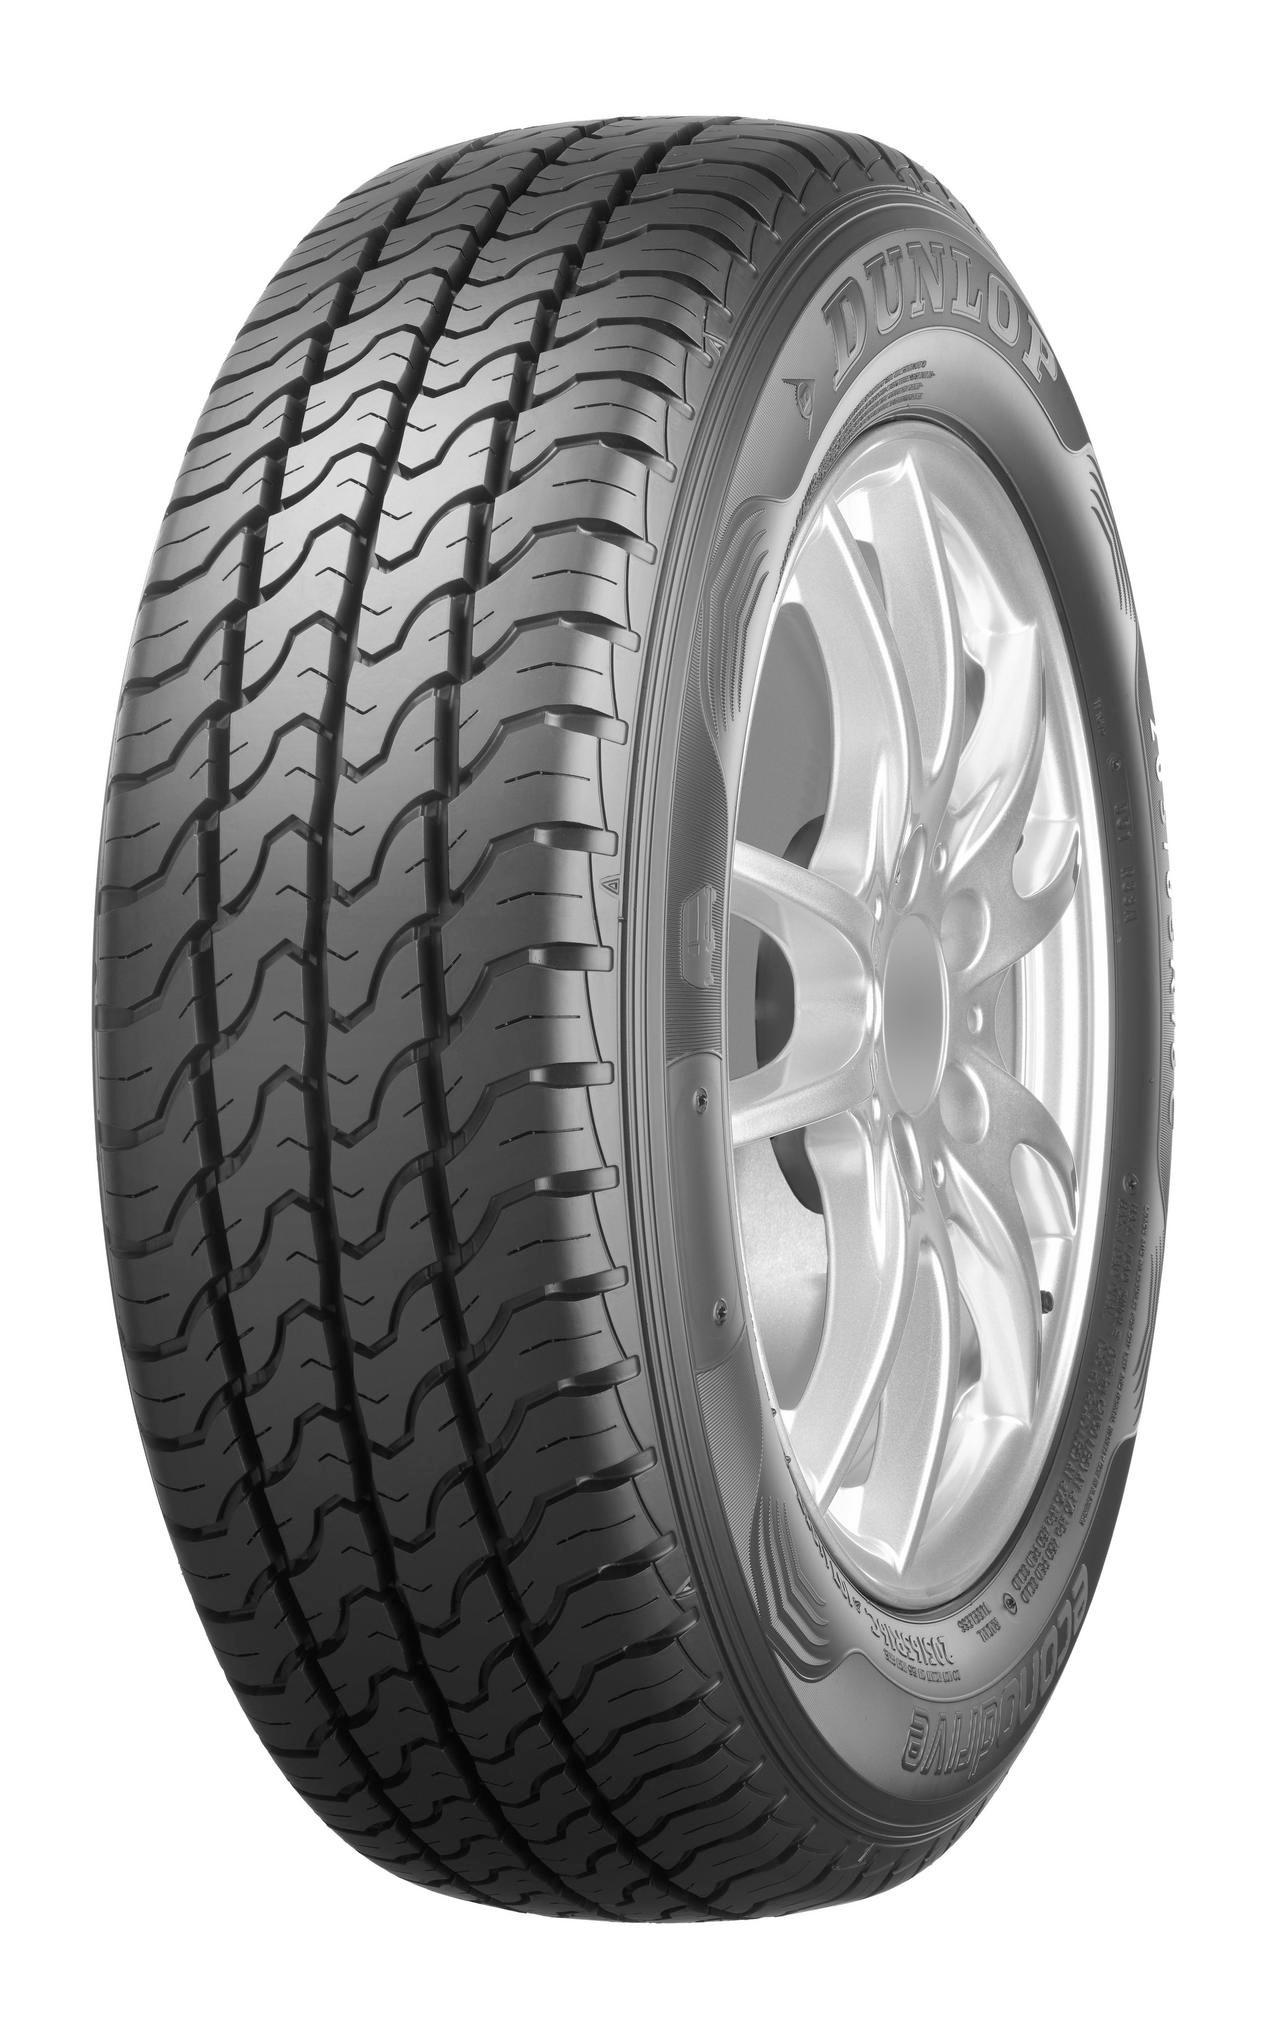 Dunlop Econodrive 195/70R15C 104/102R